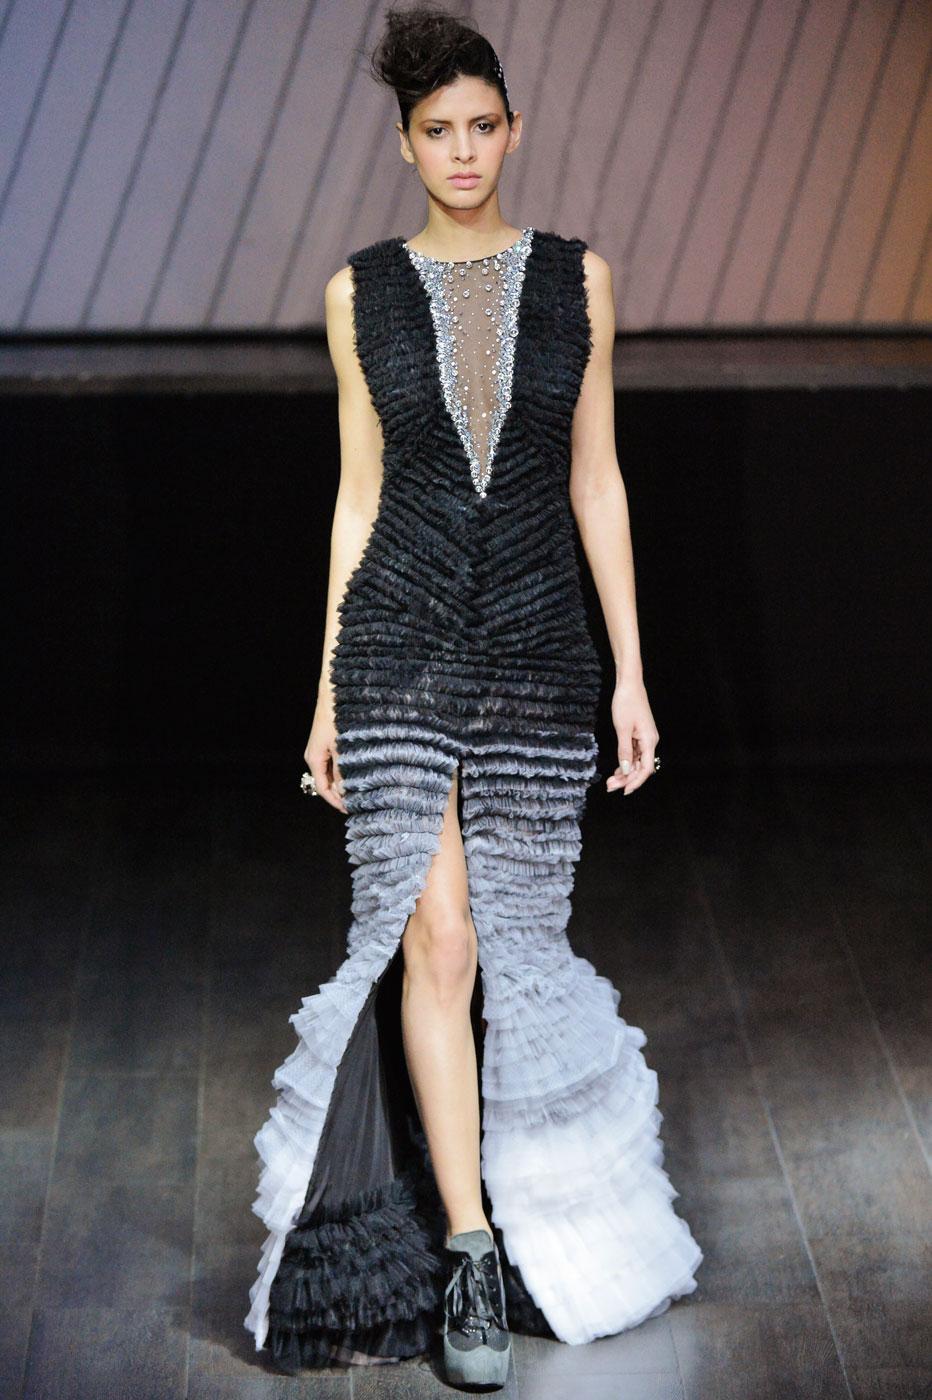 On-Aura-Tout-Vu-fashion-runway-show-haute-couture-paris-spring-summer-2015-the-impression-43